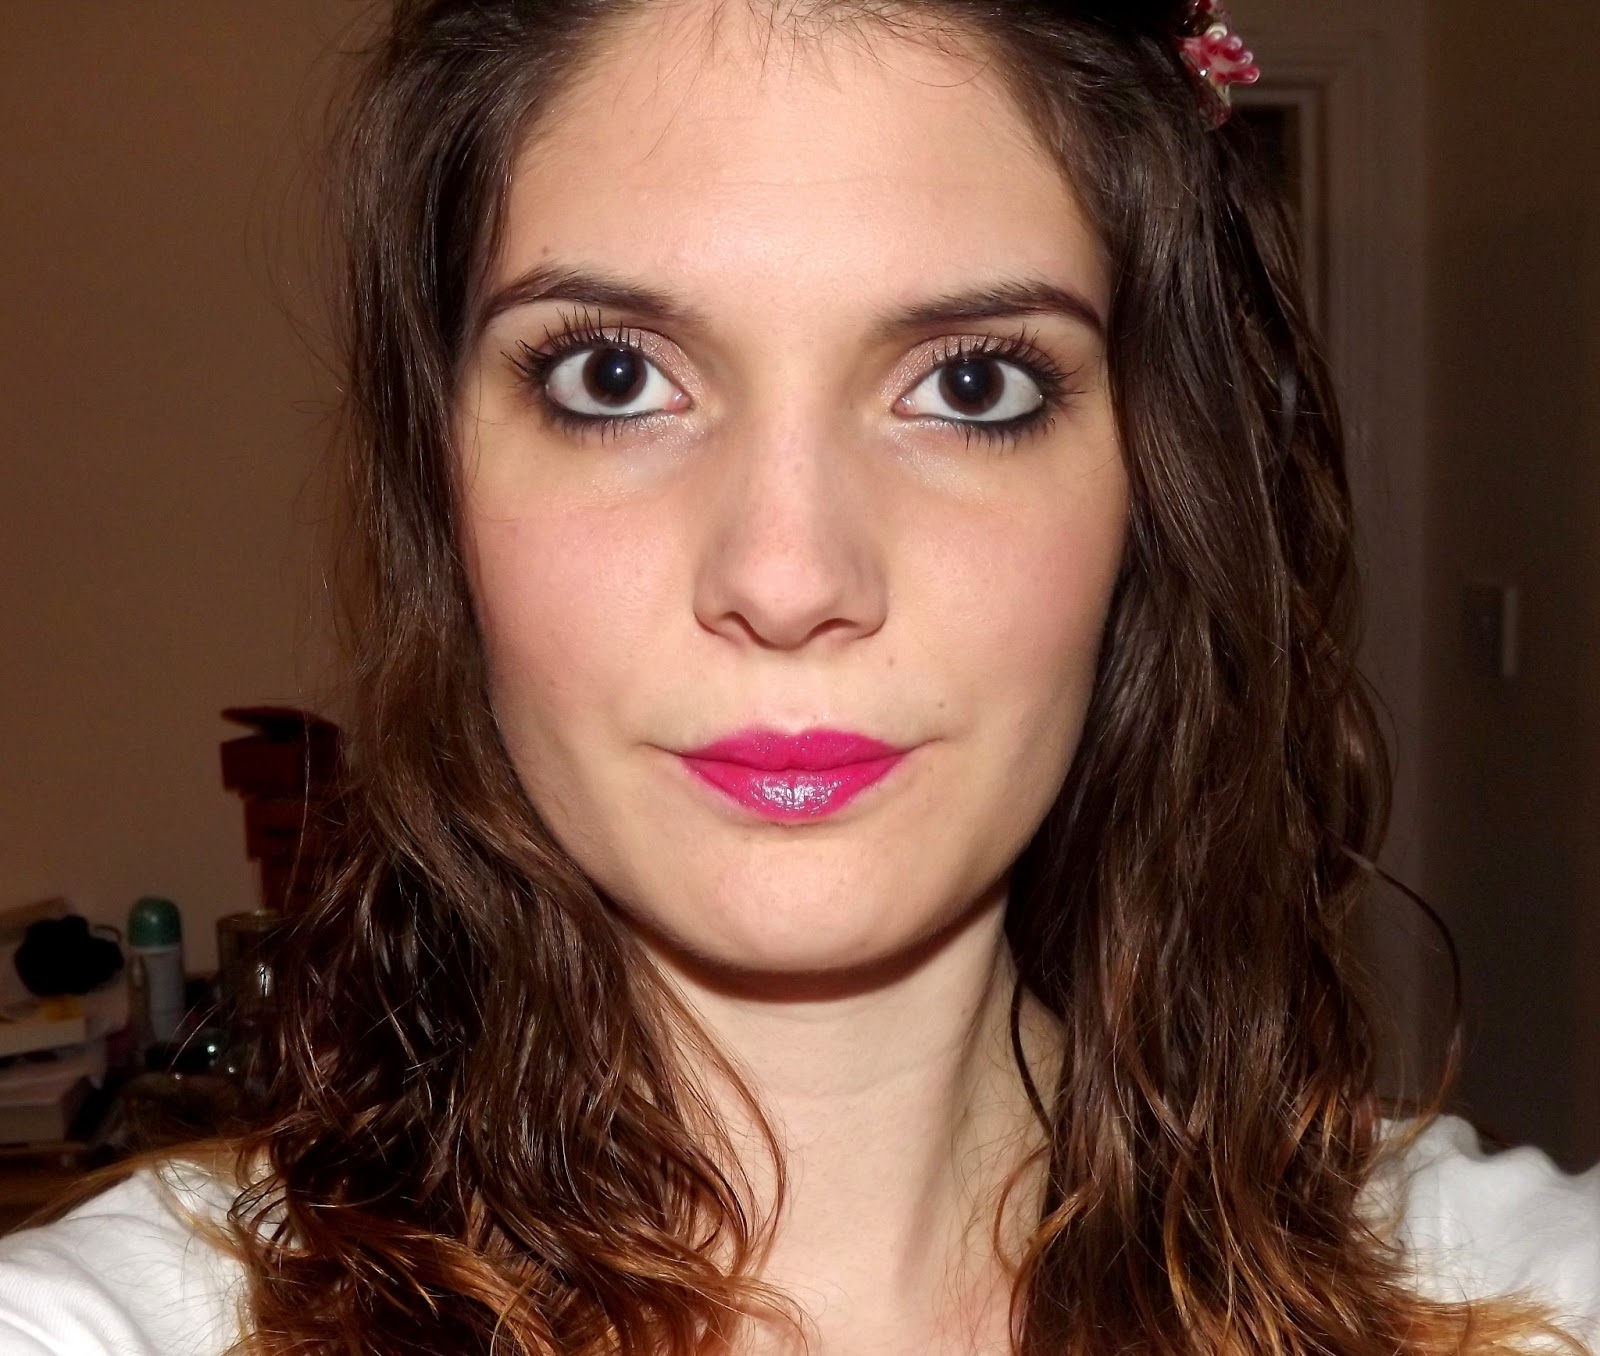 http://4.bp.blogspot.com/-kDAmLK2OaAk/UU4ETZIFpsI/AAAAAAAACzk/vuvz-zN6Ez8/s1600/bright+pink+eyes.jpg